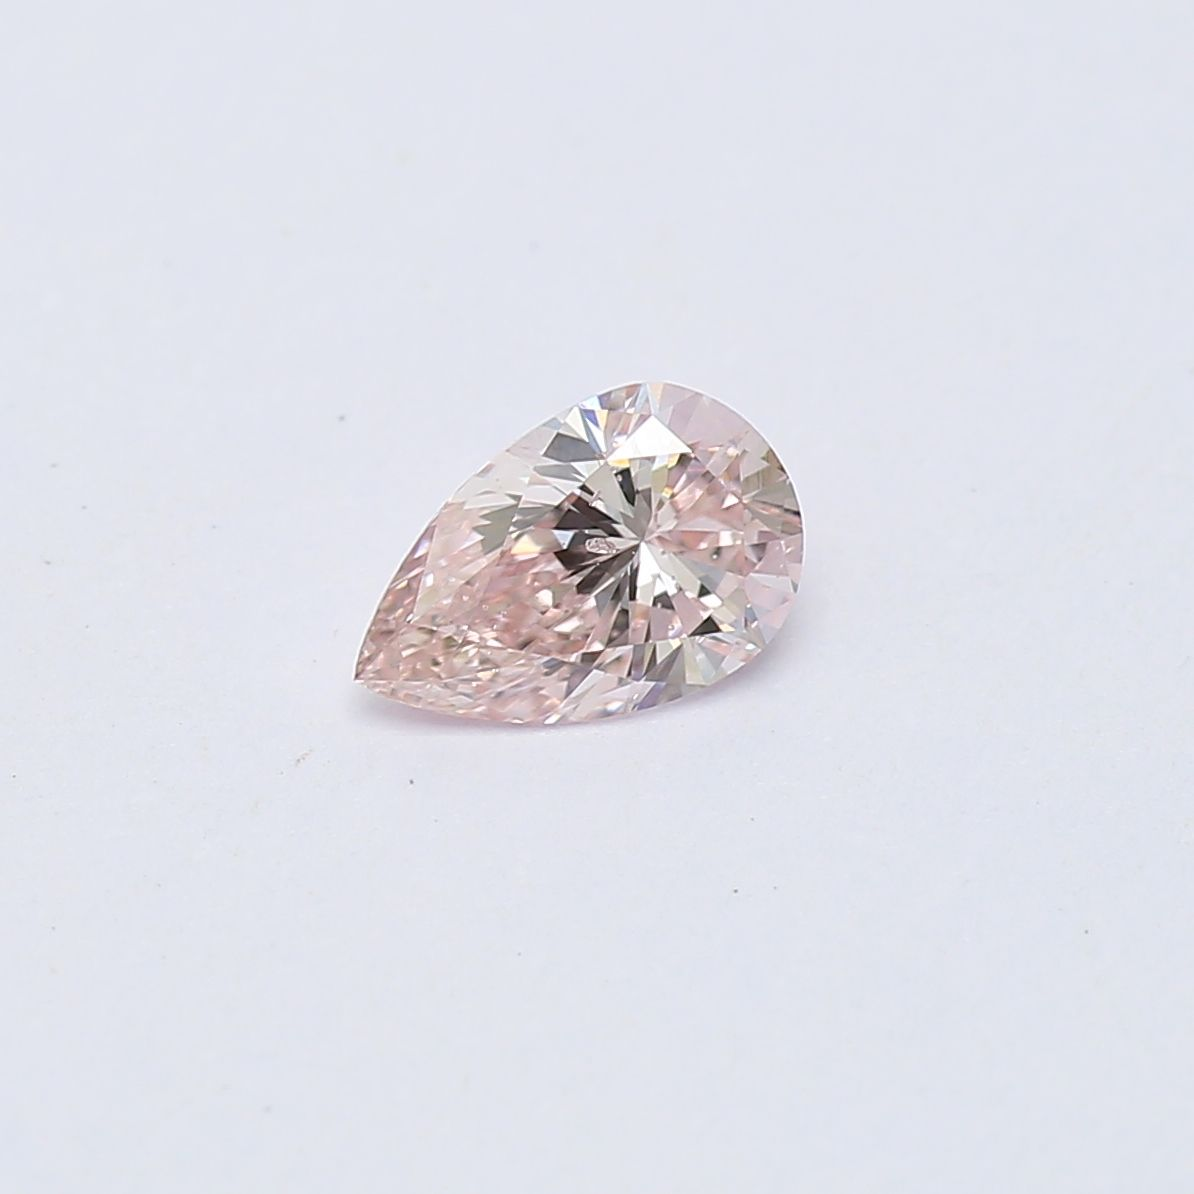 639a60707 Pear 0.15 PC1 Argyle Pink Diamond   Loose Coloured Diamonds ...